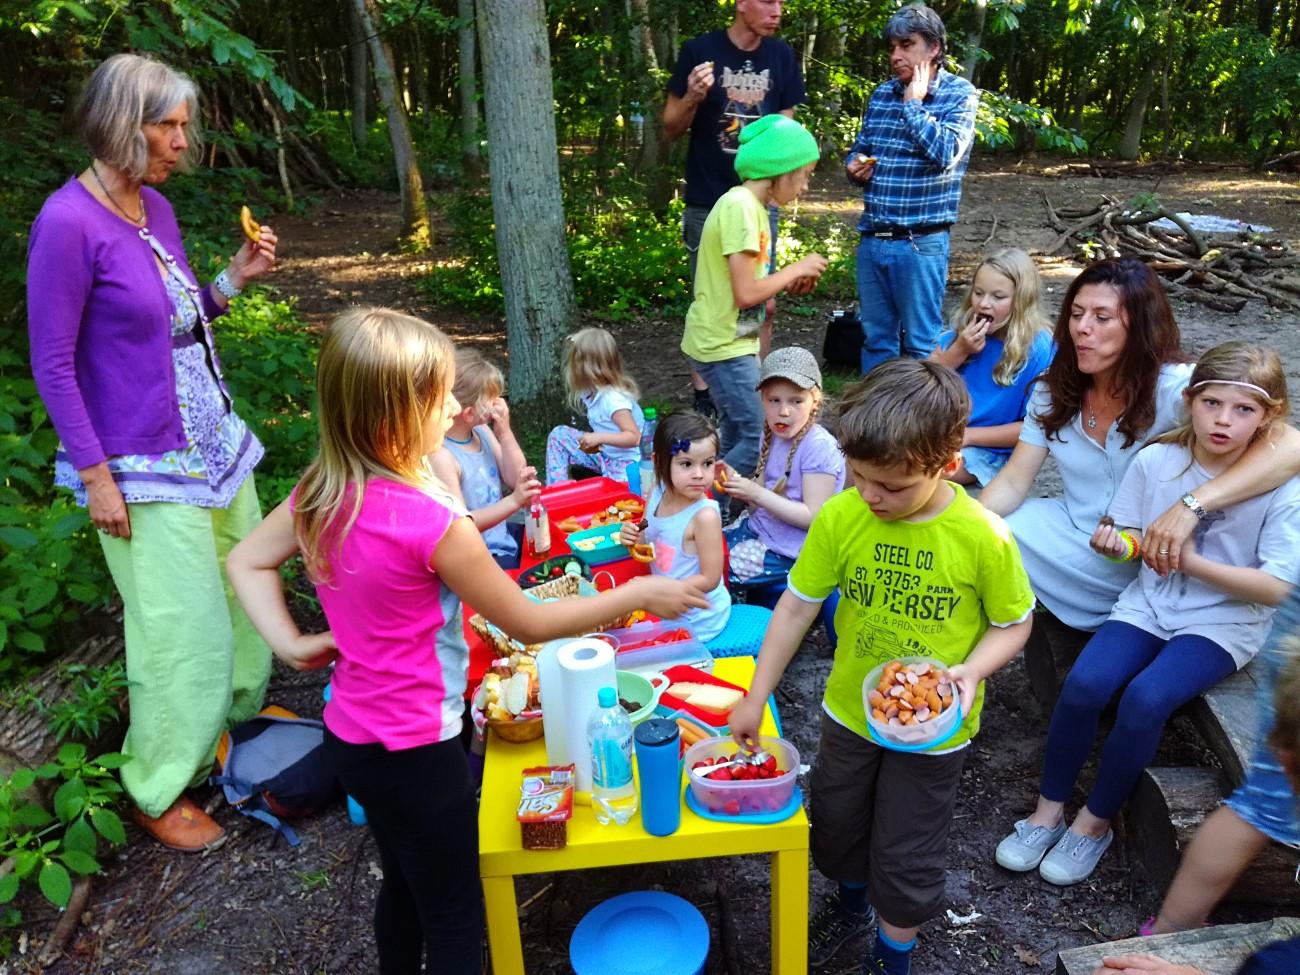 Eltern-Kind-Picknick